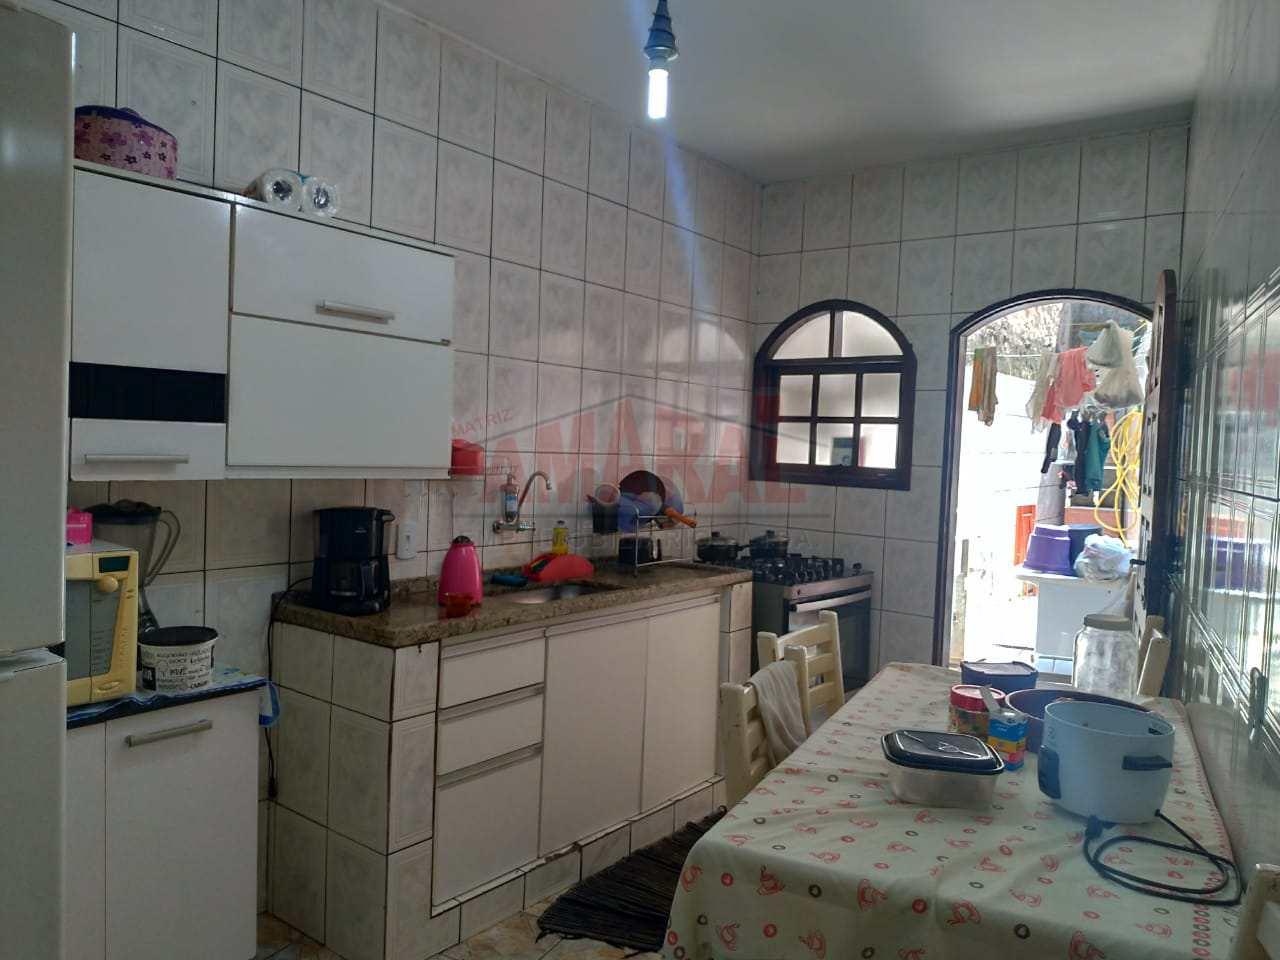 Sobrado com 3 dorms, Cidade Satélite Santa Bárbara, São Paulo - R$ 250 mil, Cod: 11278